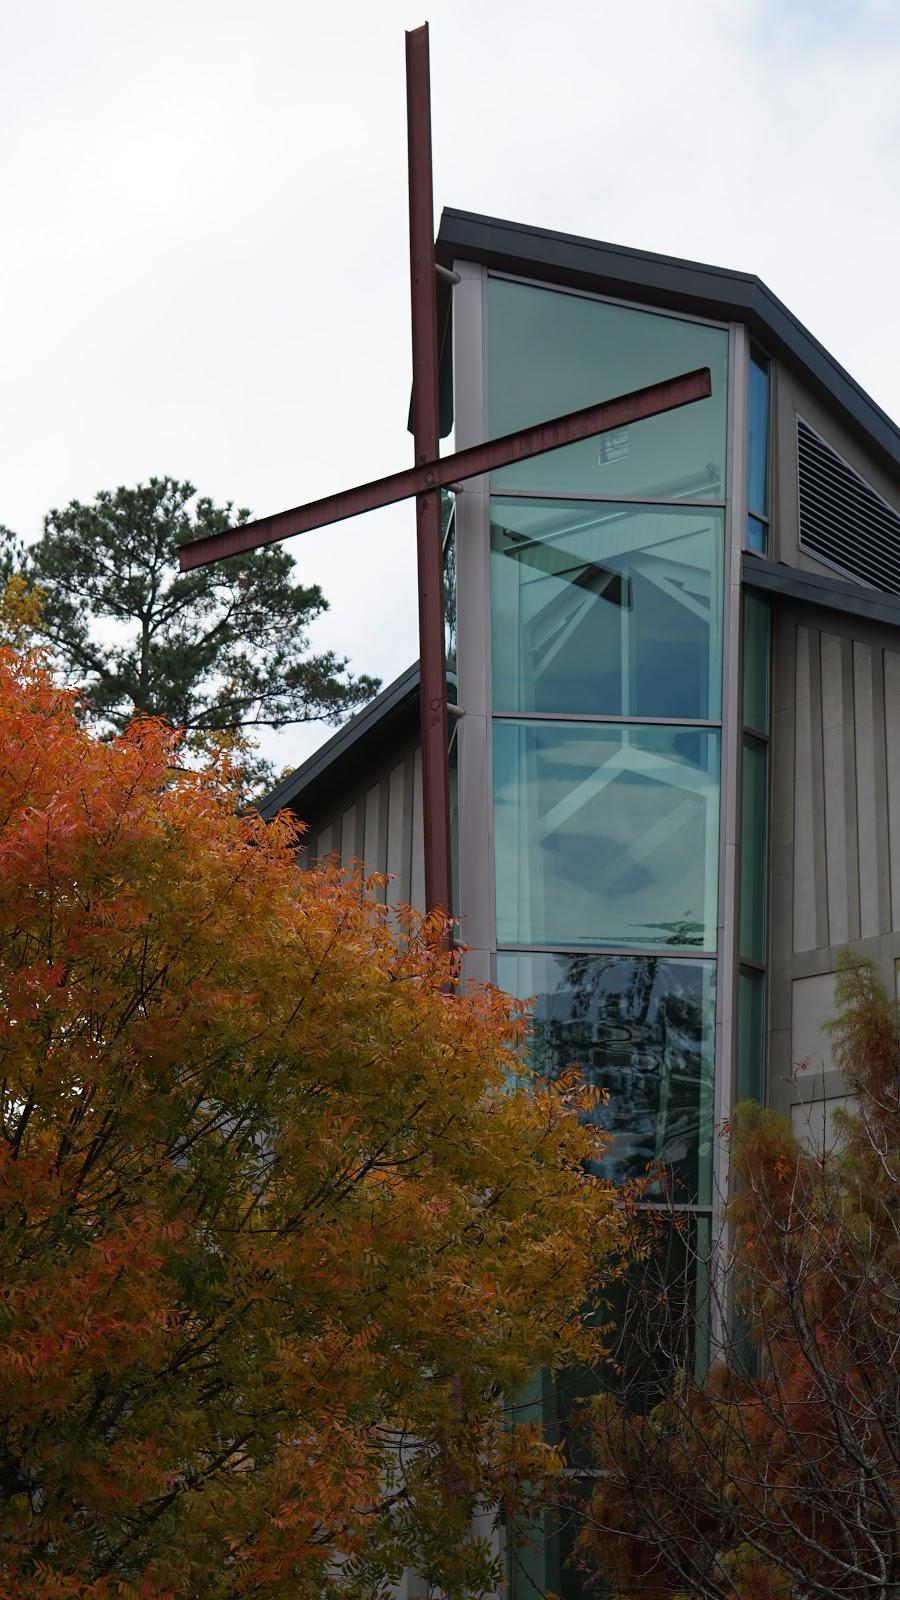 Dunwoody Community Church - church  | Photo 7 of 10 | Address: 2250 Dunwoody Club Dr, Atlanta, GA 30350, USA | Phone: (770) 396-8600